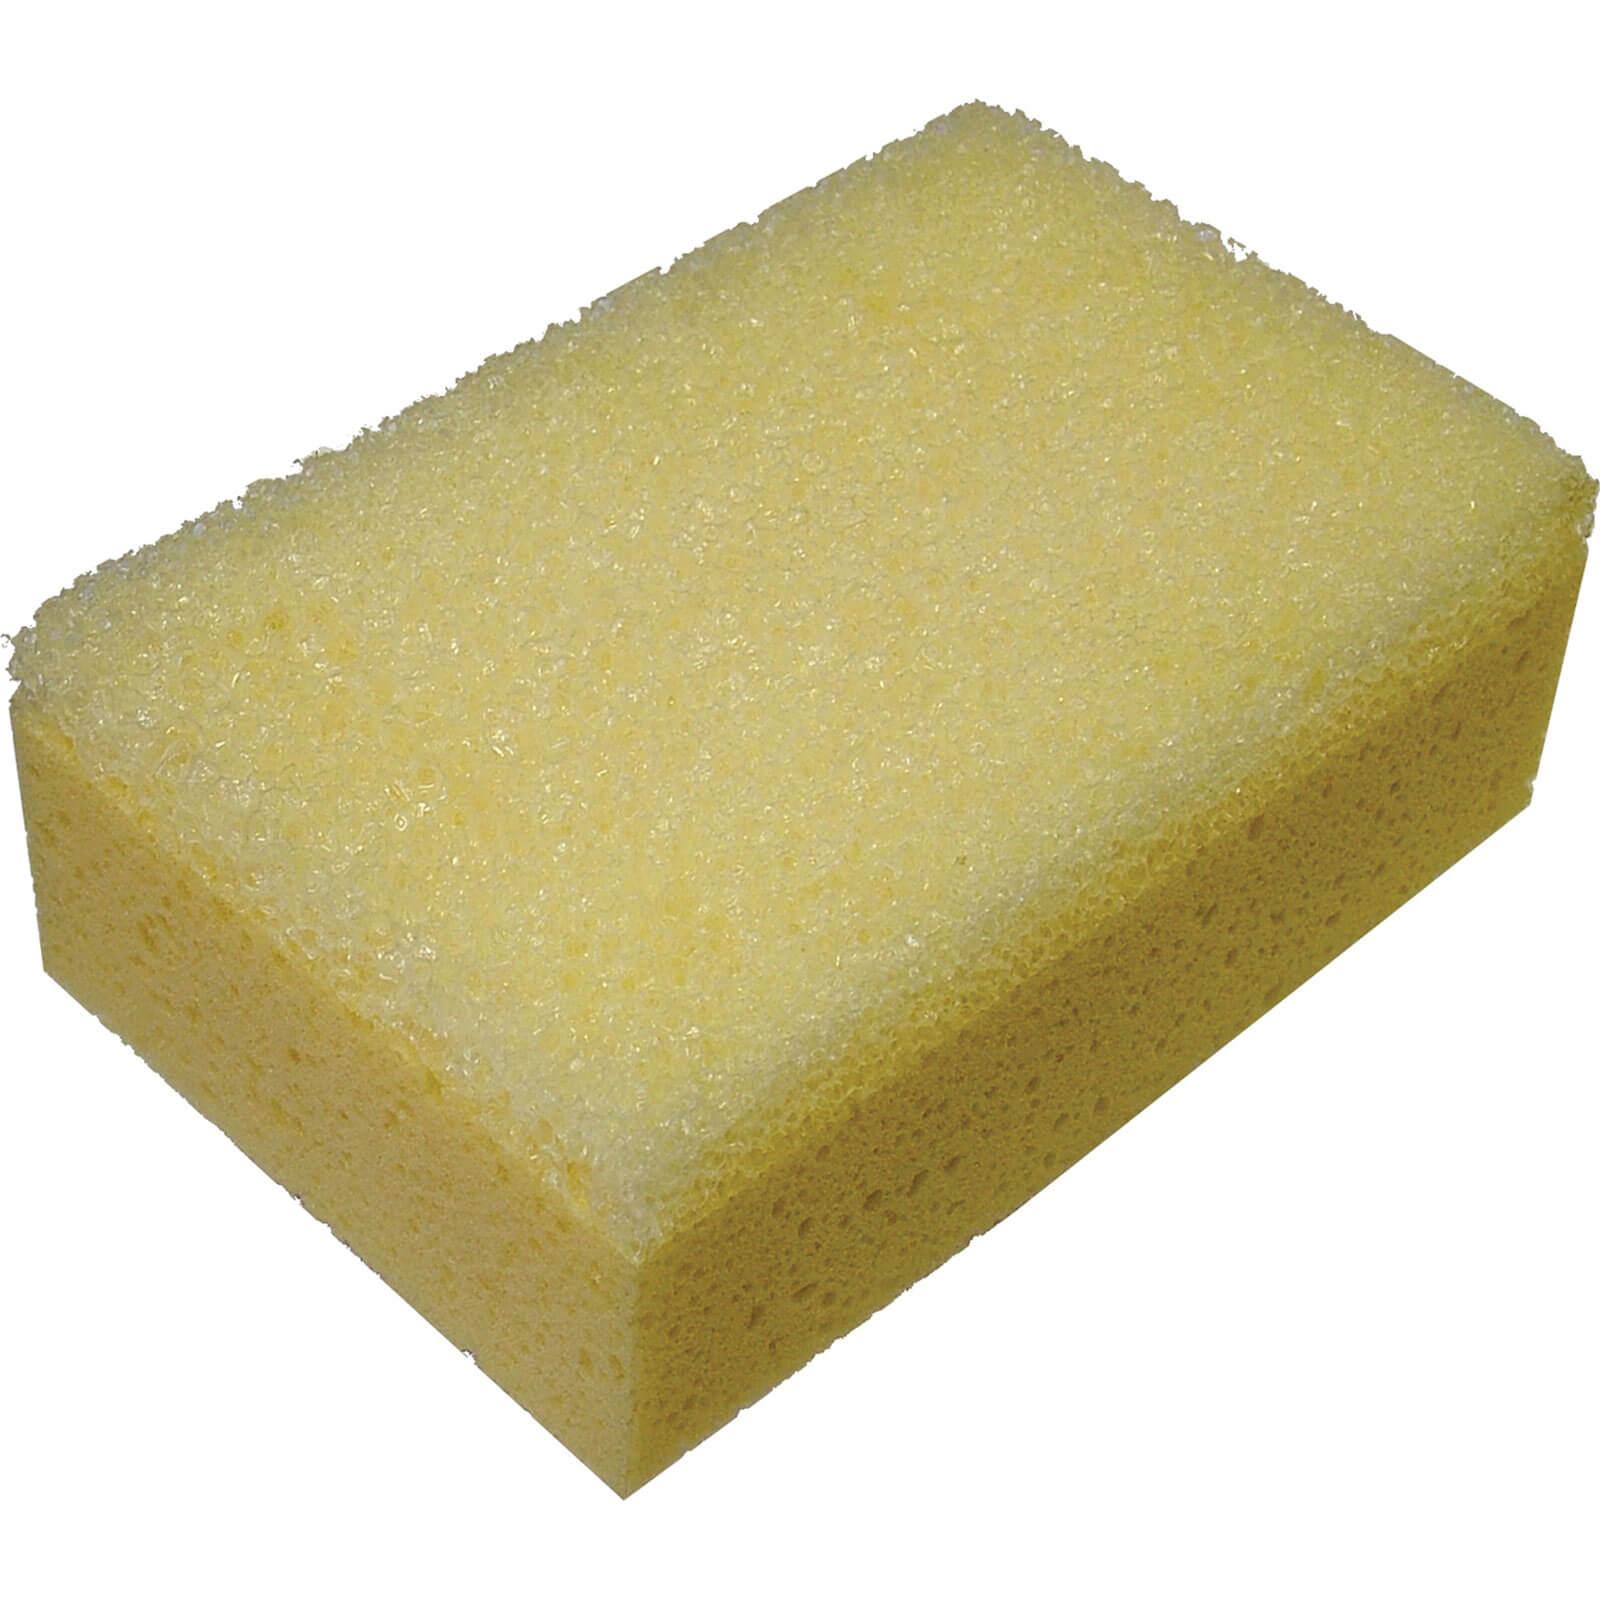 Image of Faithfull Professional Tile Grouting Sponge